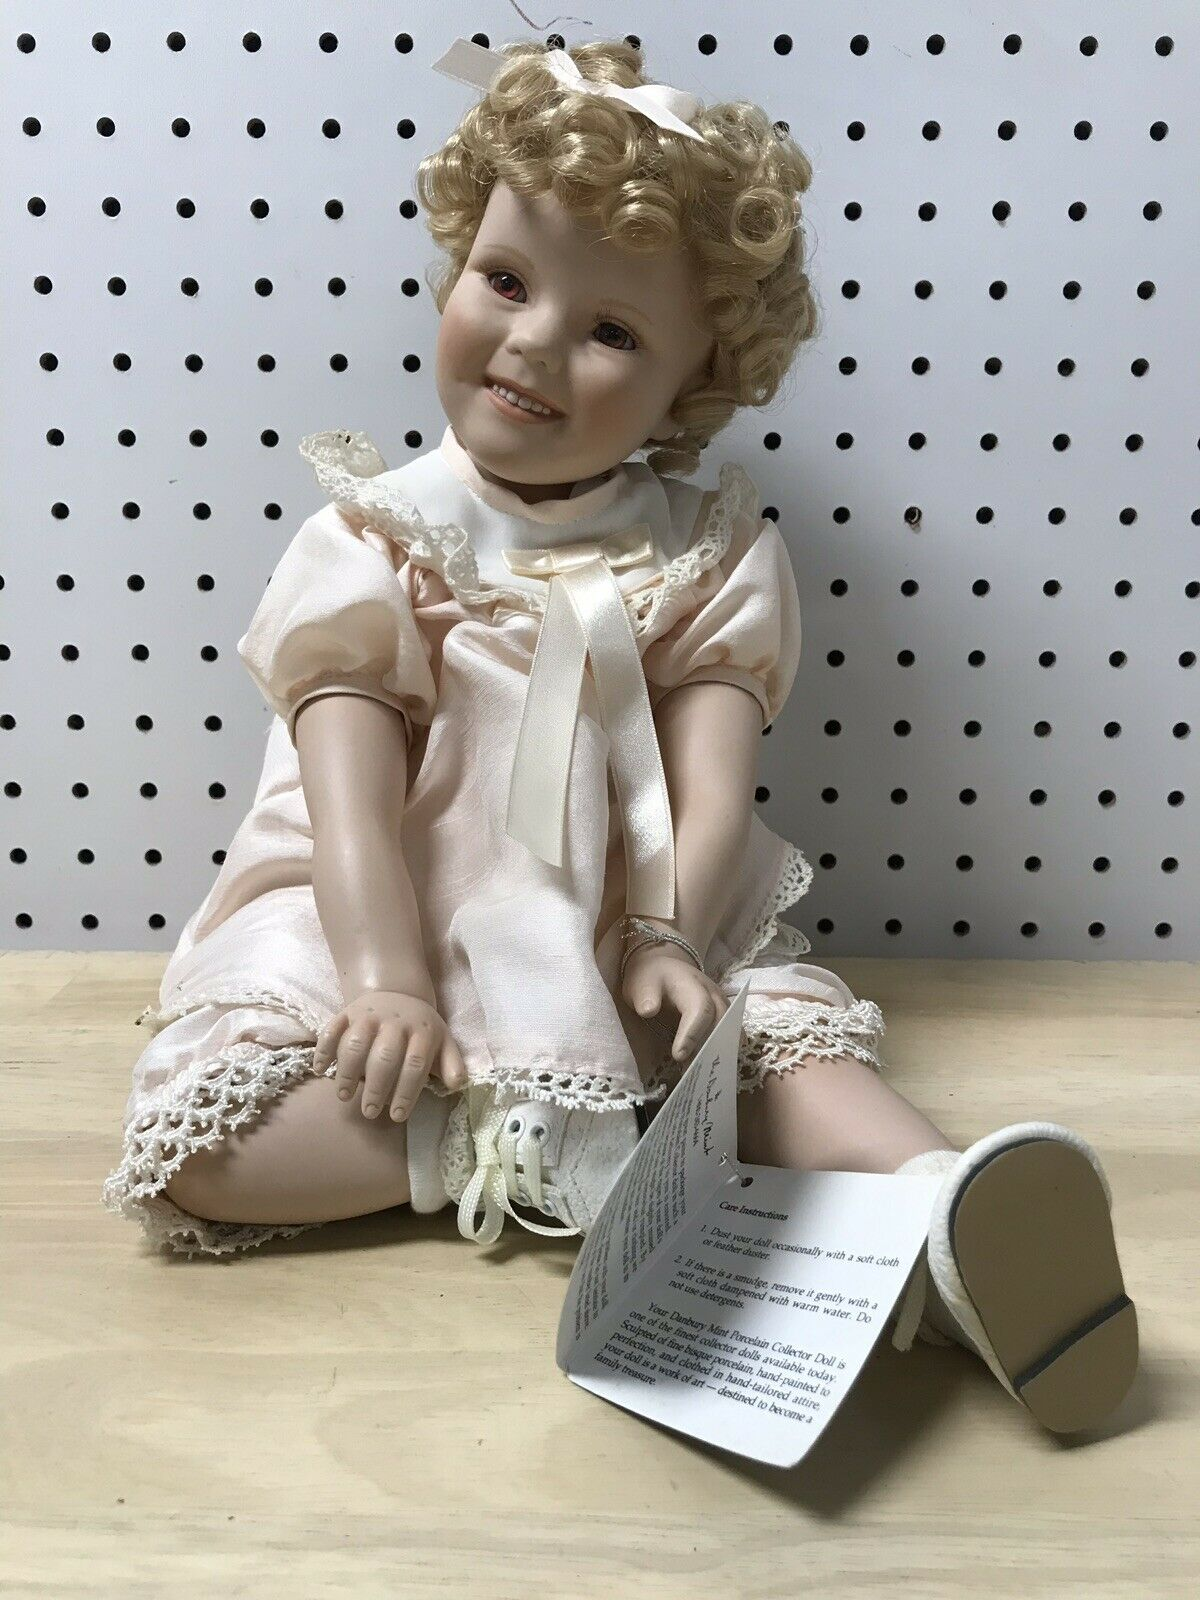 Little Miss Shirley Muñeca Darby Menta 1997 Fina Porcelana Muñeca con Caja Original